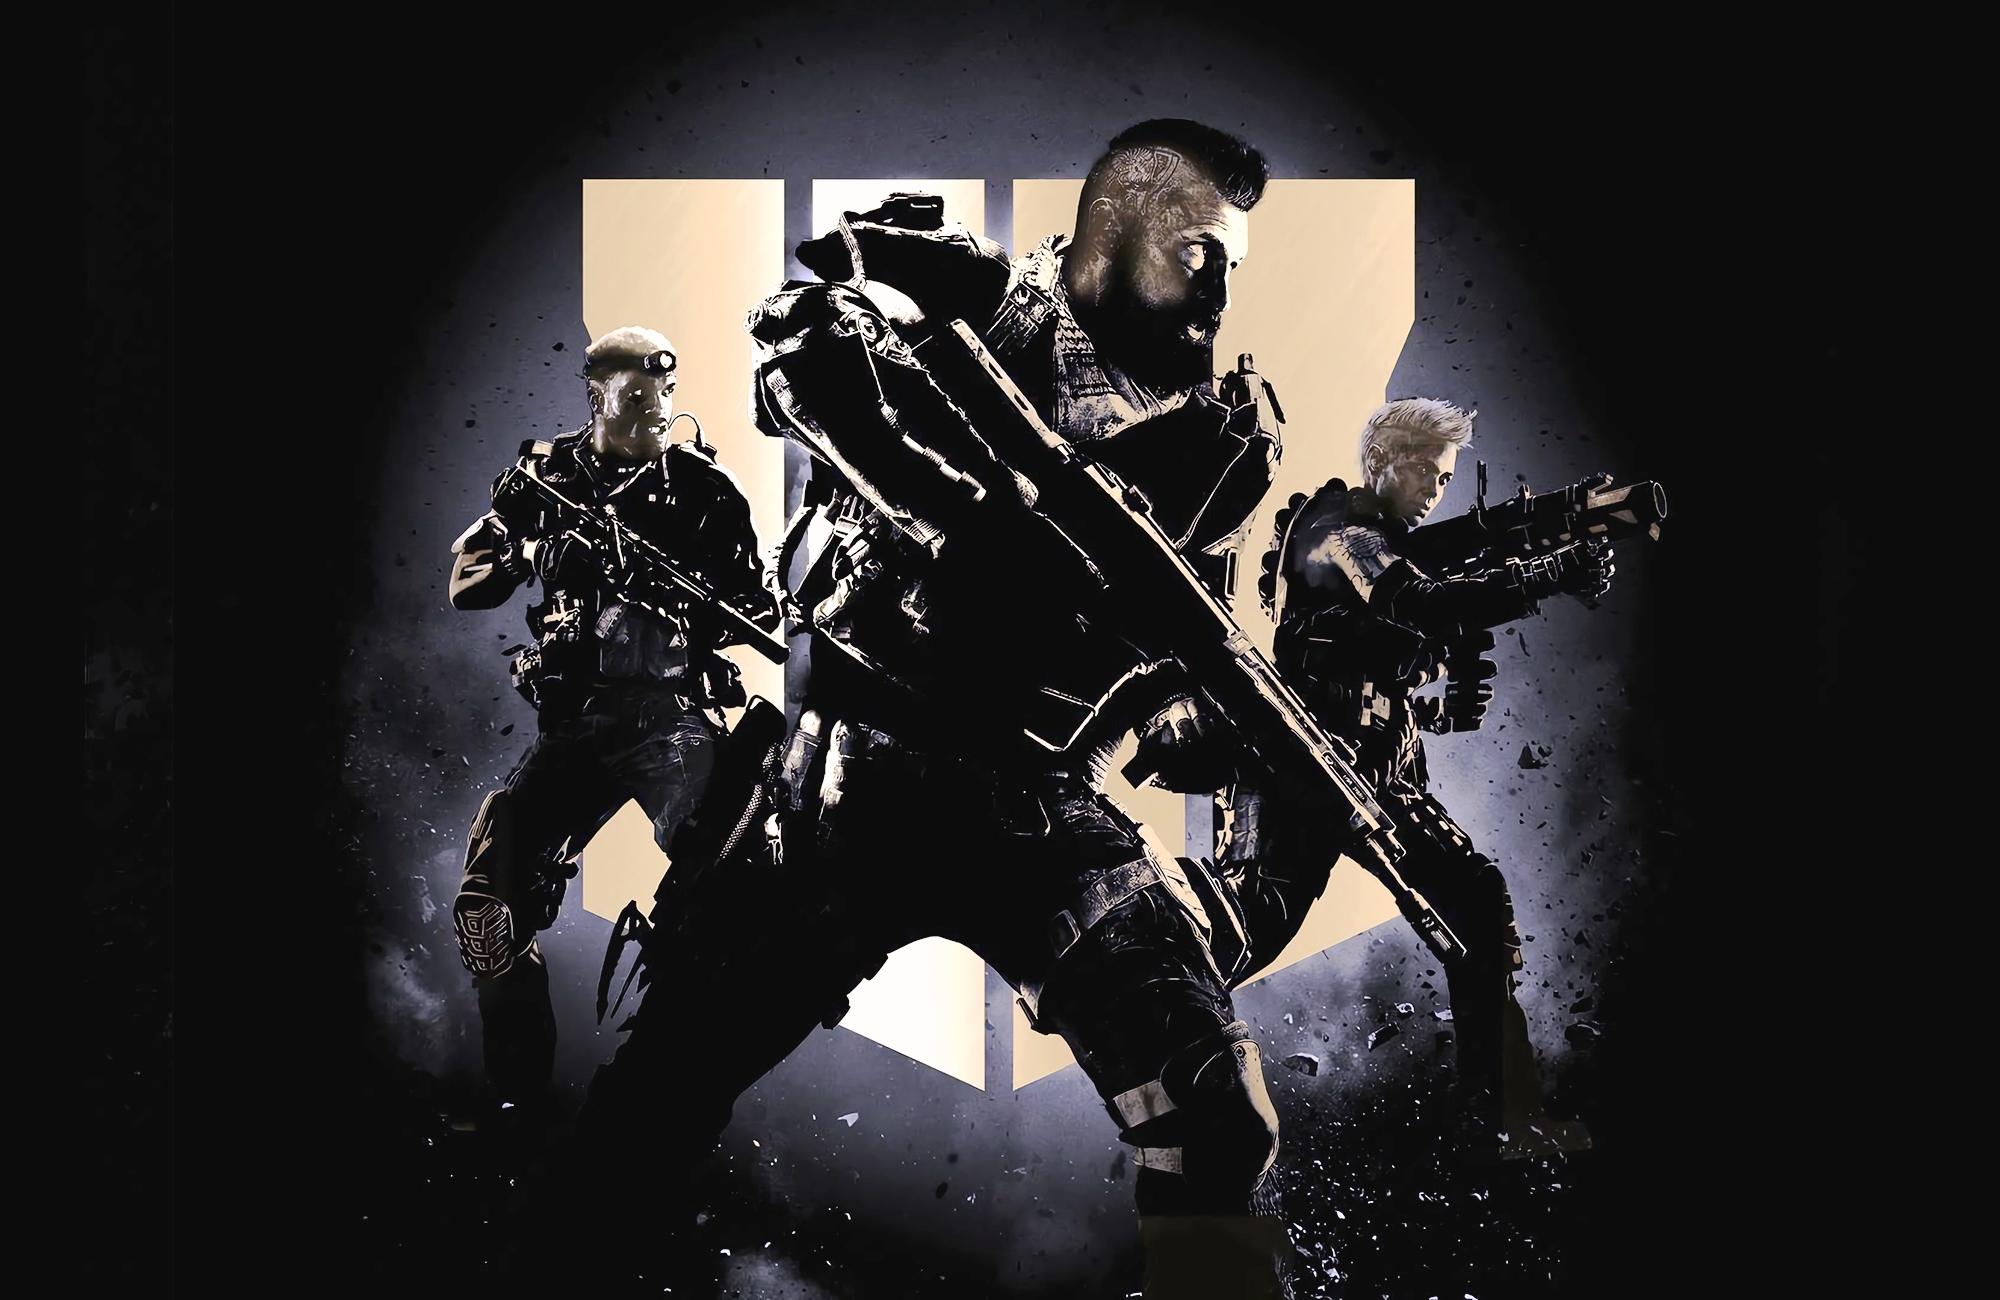 call of duty black ops 4 amazon